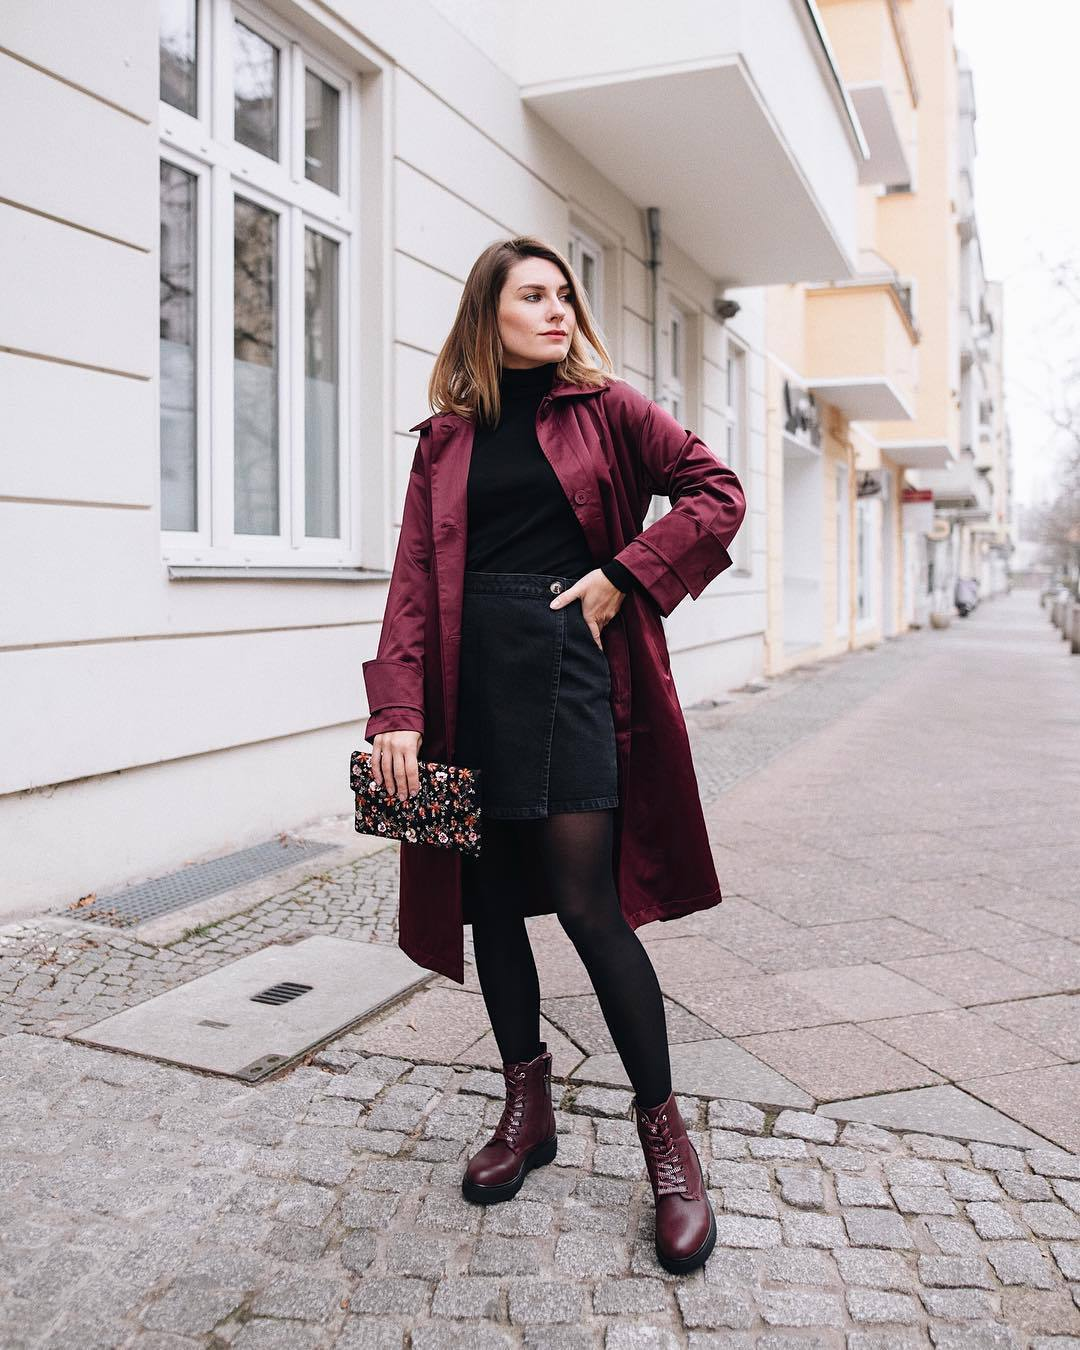 skirt wrap skirt denim skirt black skirt lace up boots tights bag coat black turtleneck top